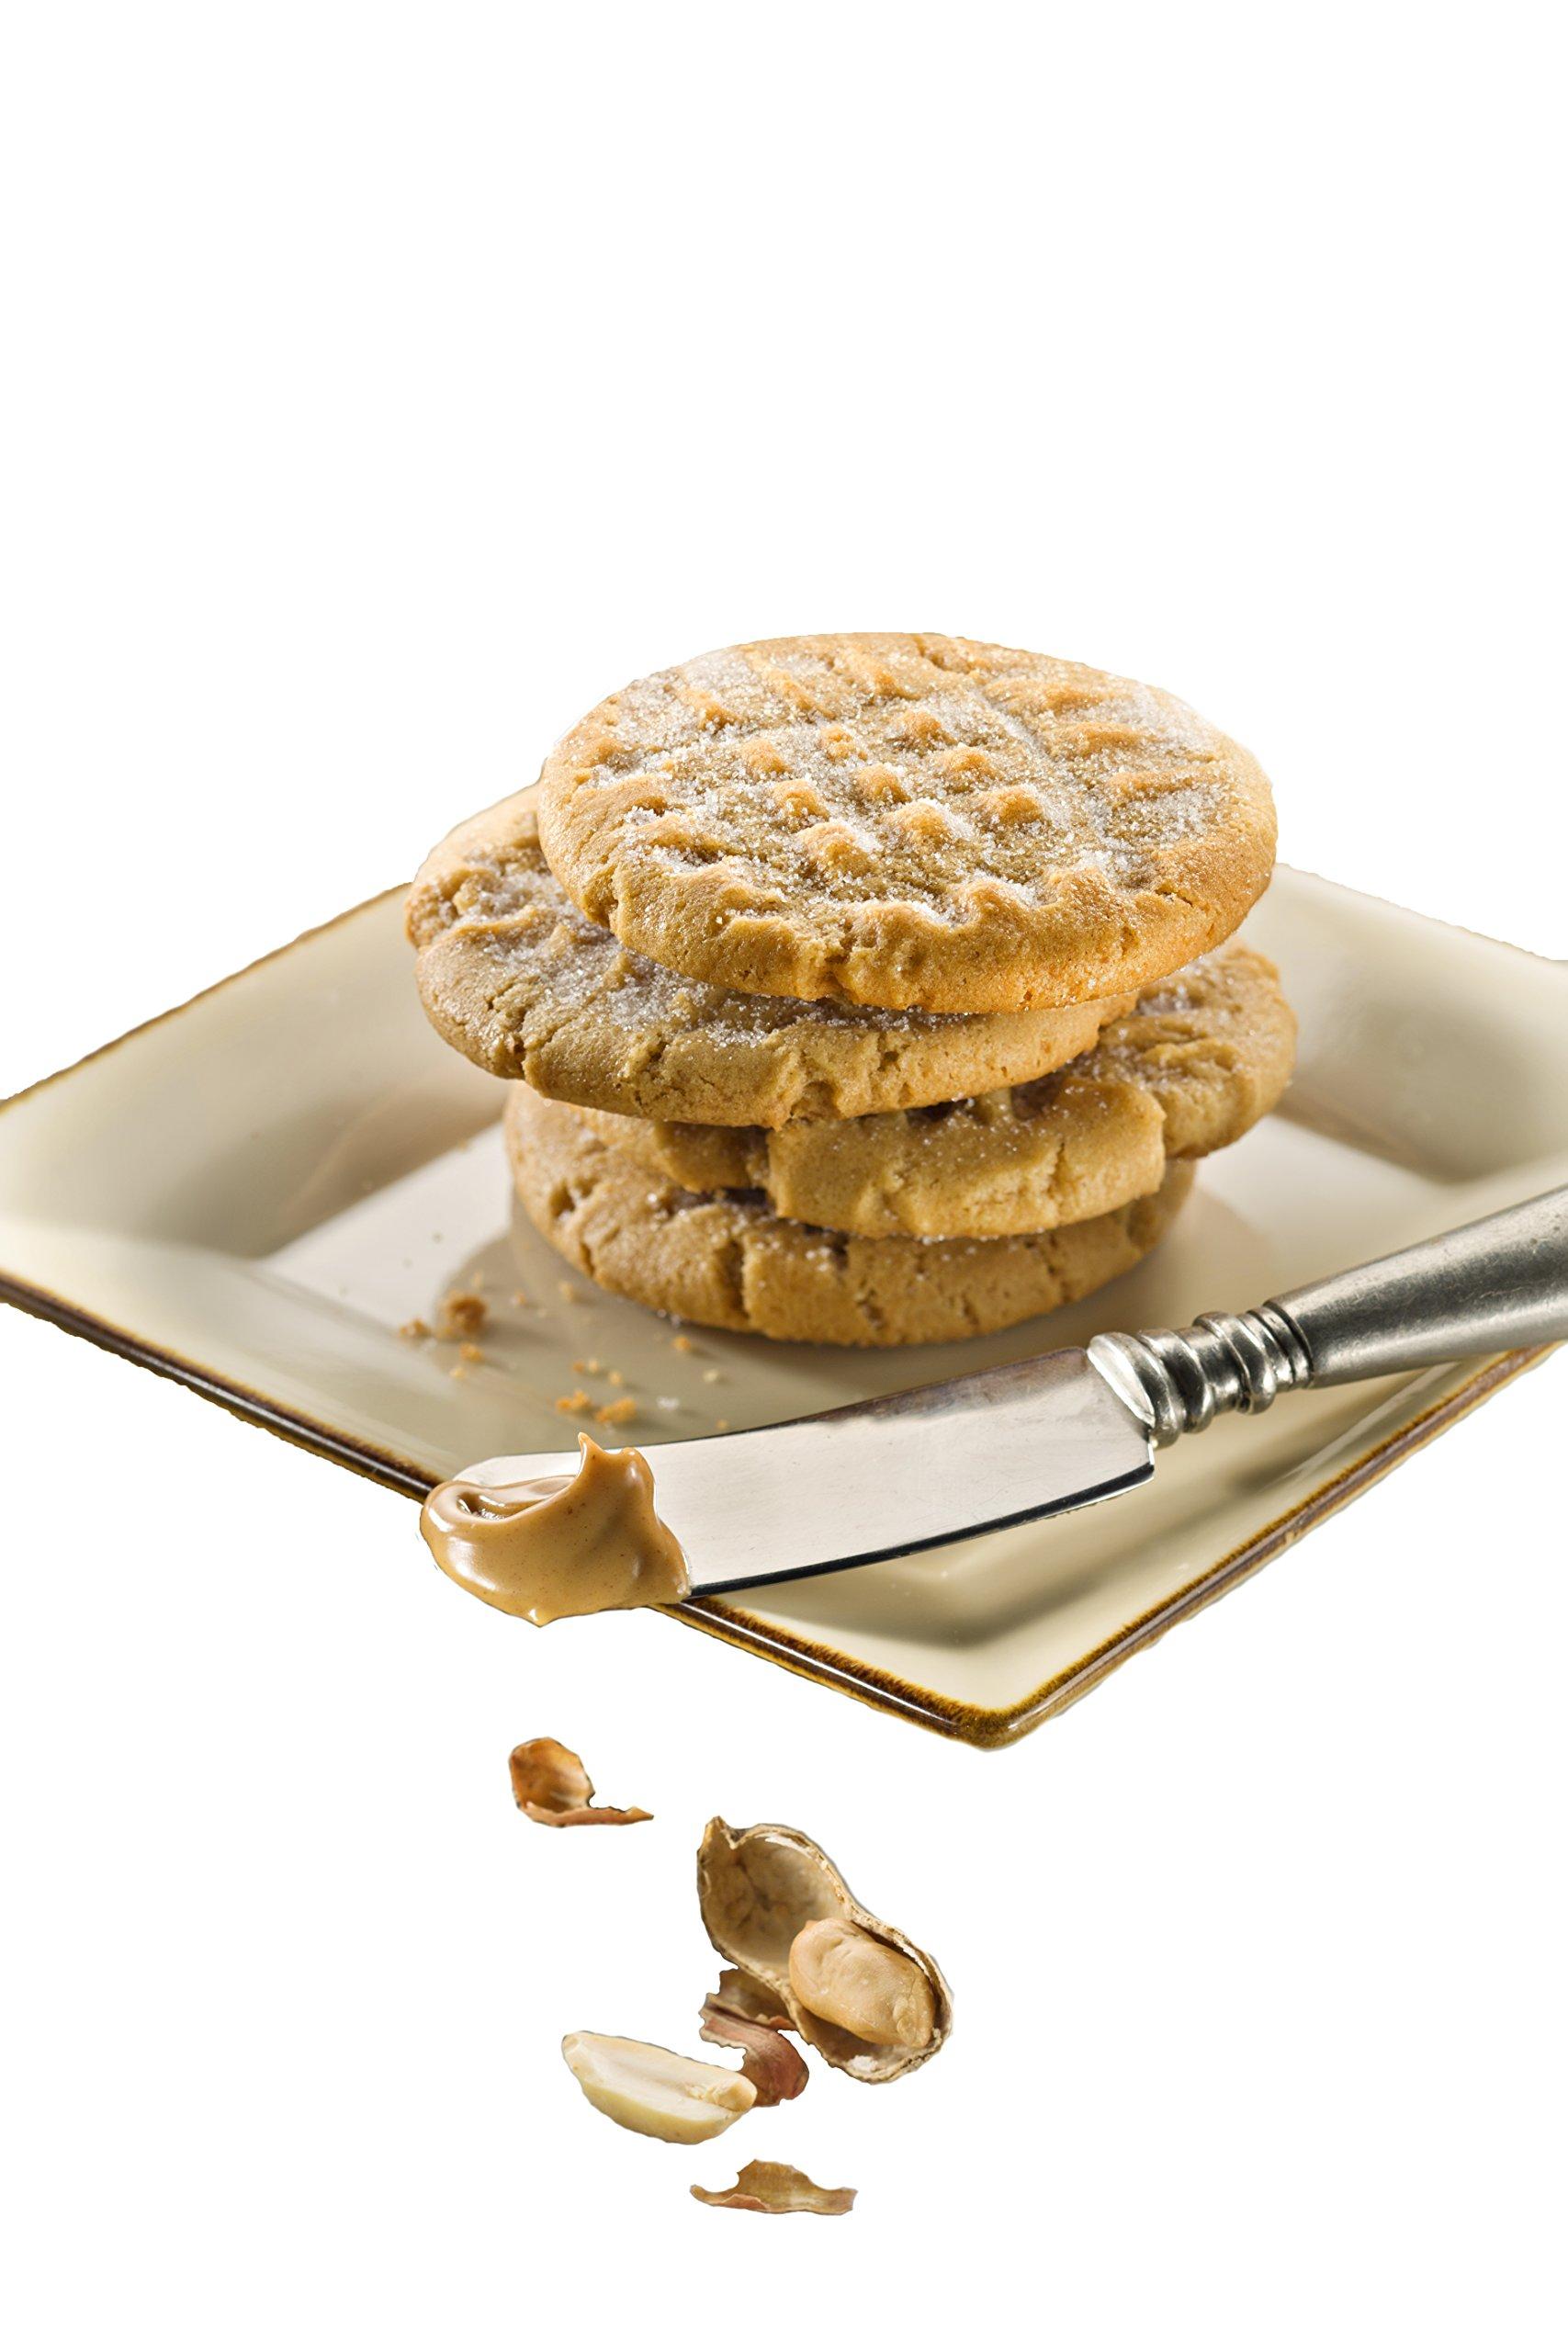 Neighbors Peanut Butter Cookie Dough, 2.7 Pound